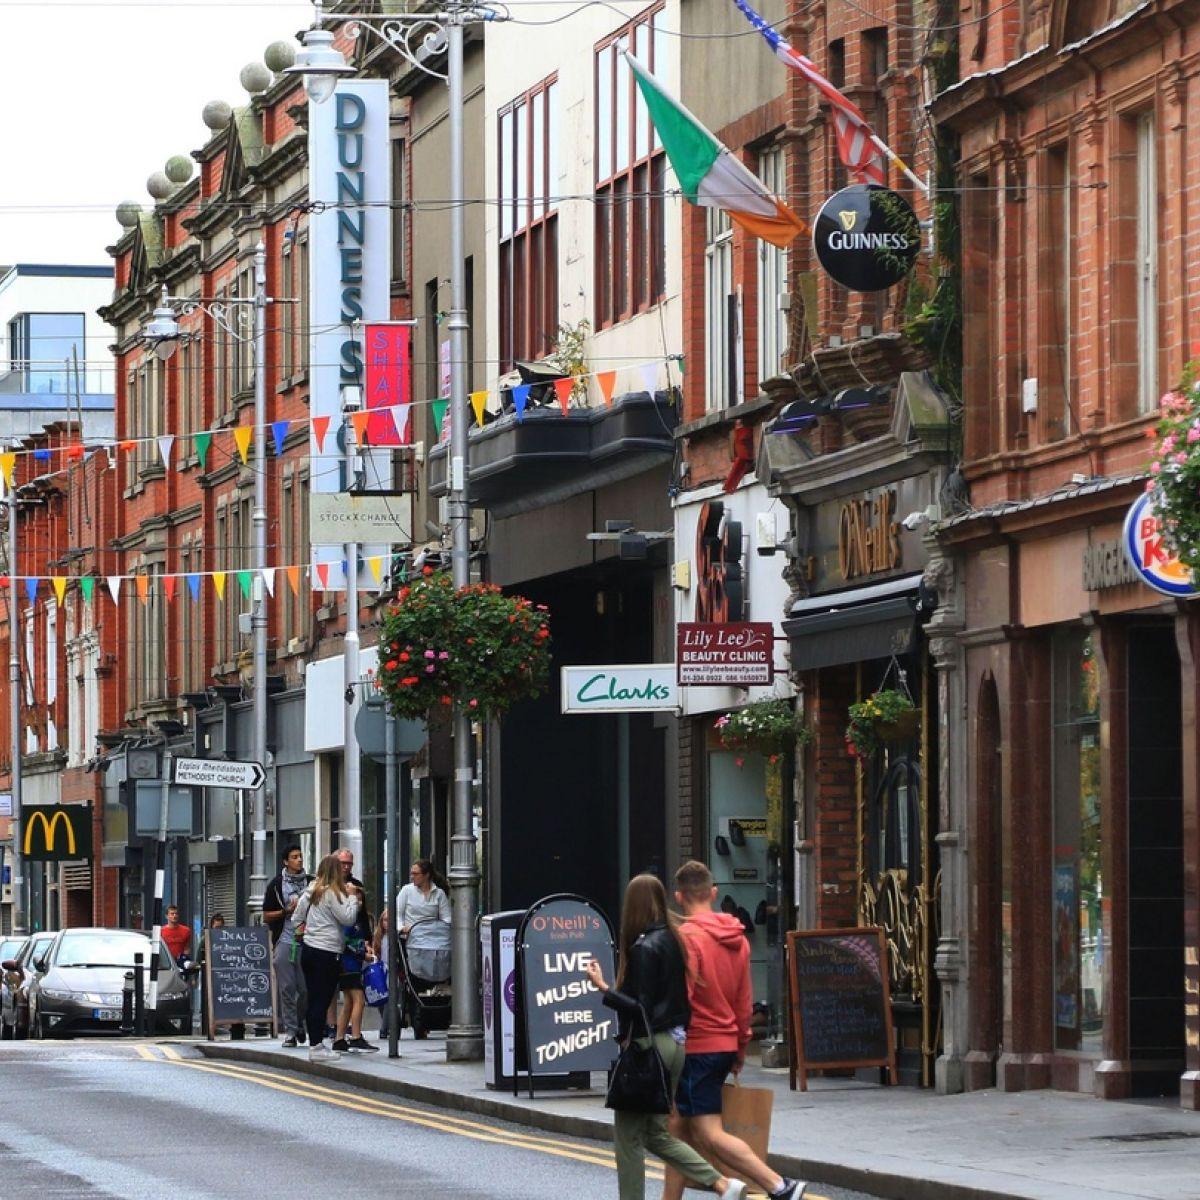 Dublin, Ireland Dun Laoghaire Events | Eventbrite